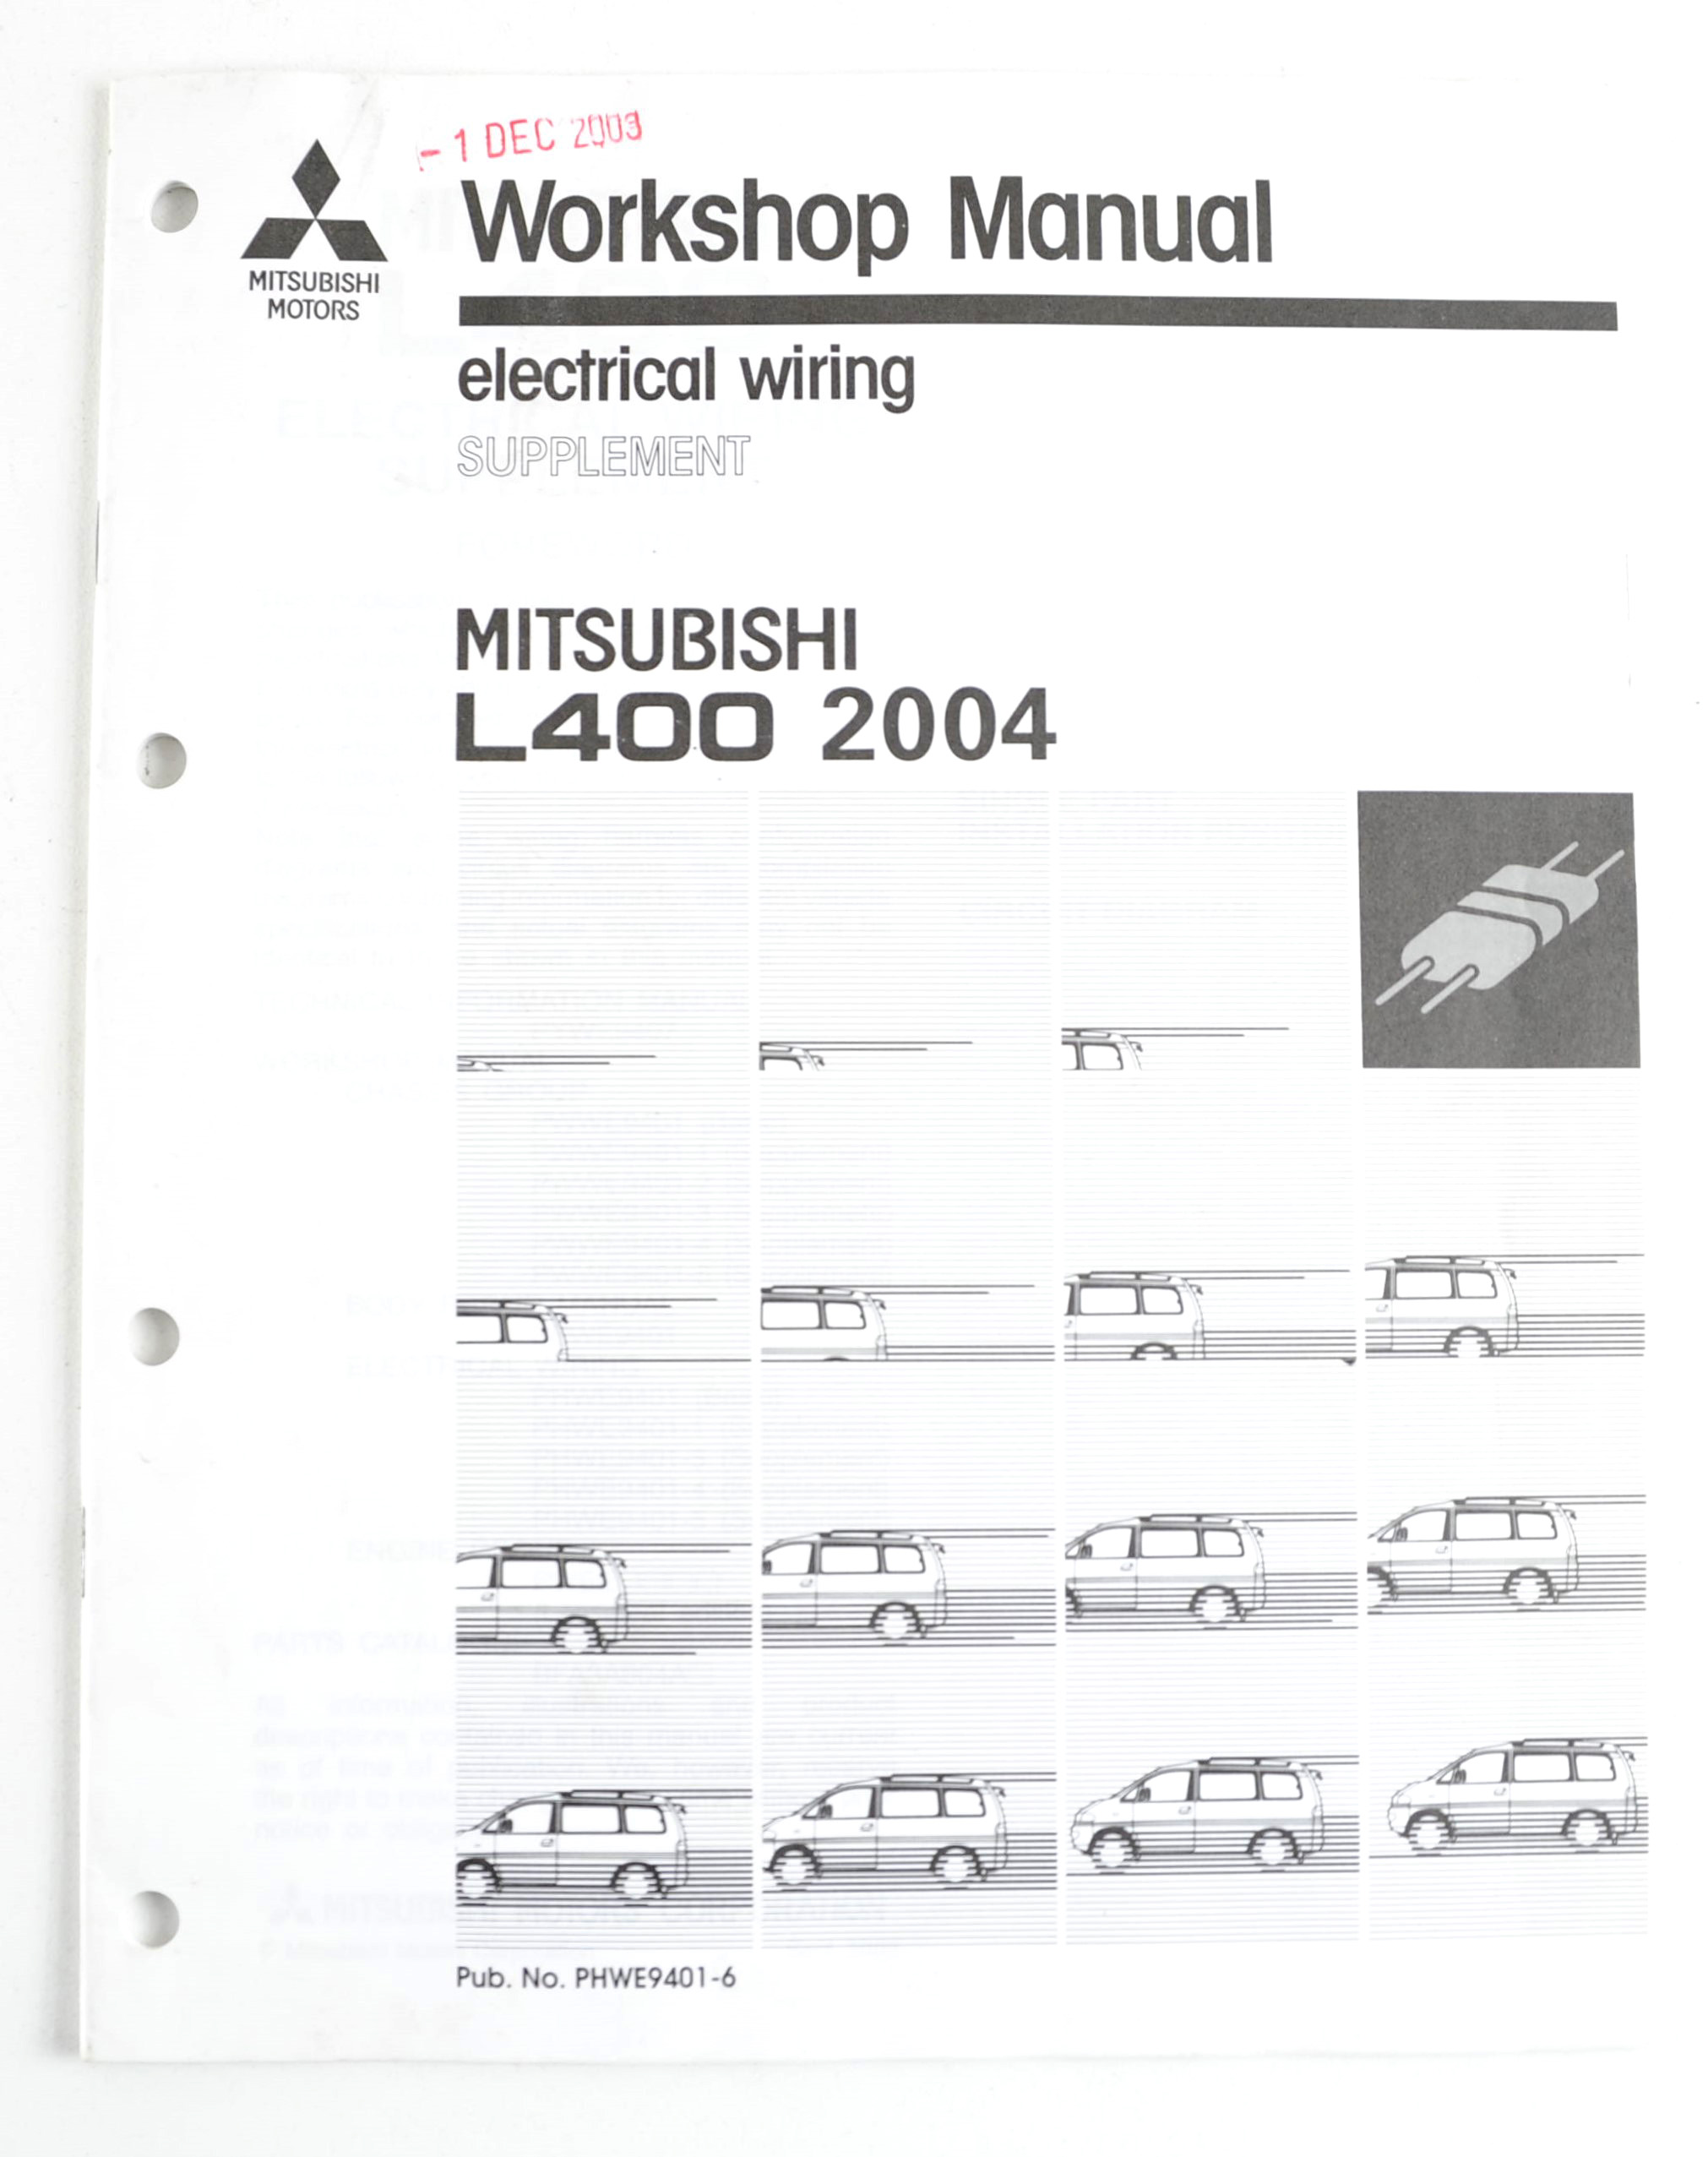 Part No: PHWE9401-6. $ 44. Buy / Read More. Mitsubishi L400 1997 factory workshop  manual ...